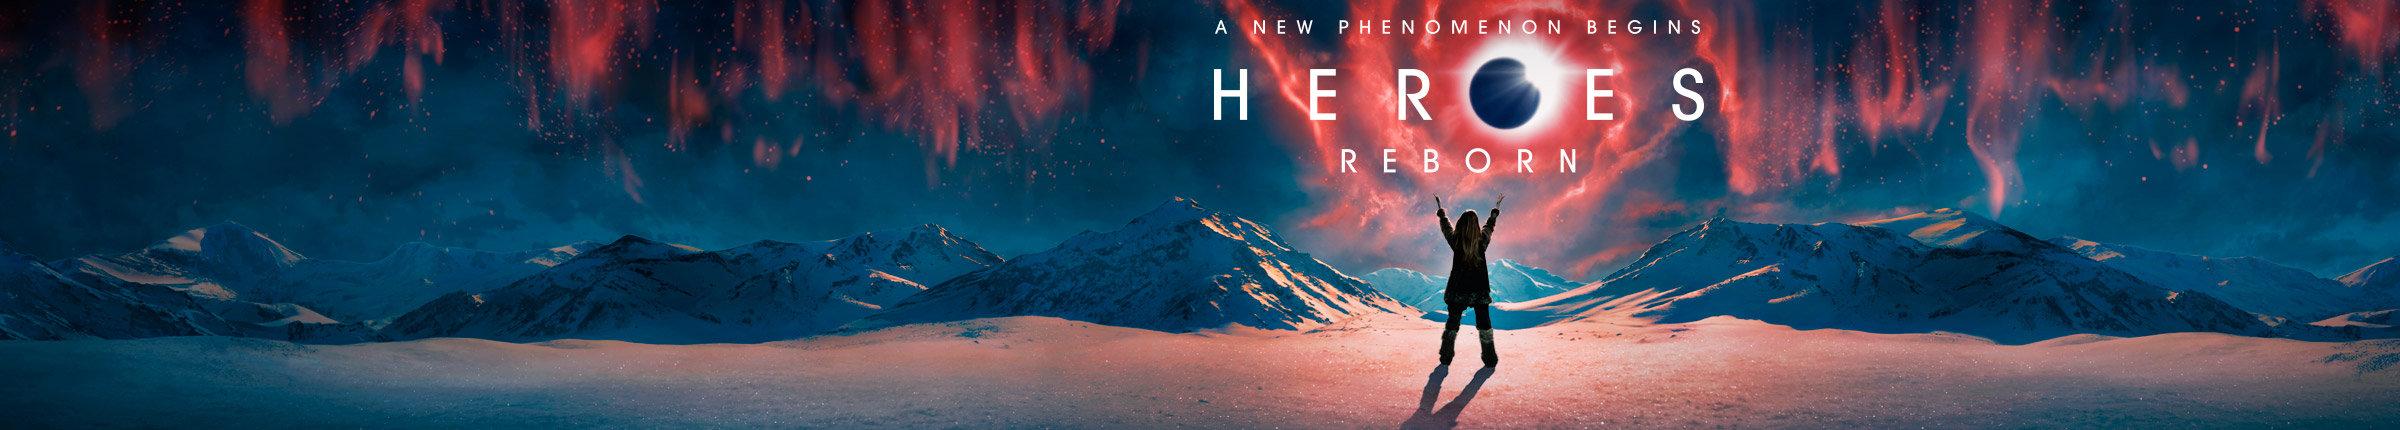 [影集] Heroes Reborn (2015~2016) HeroesRB_Ext_Horz